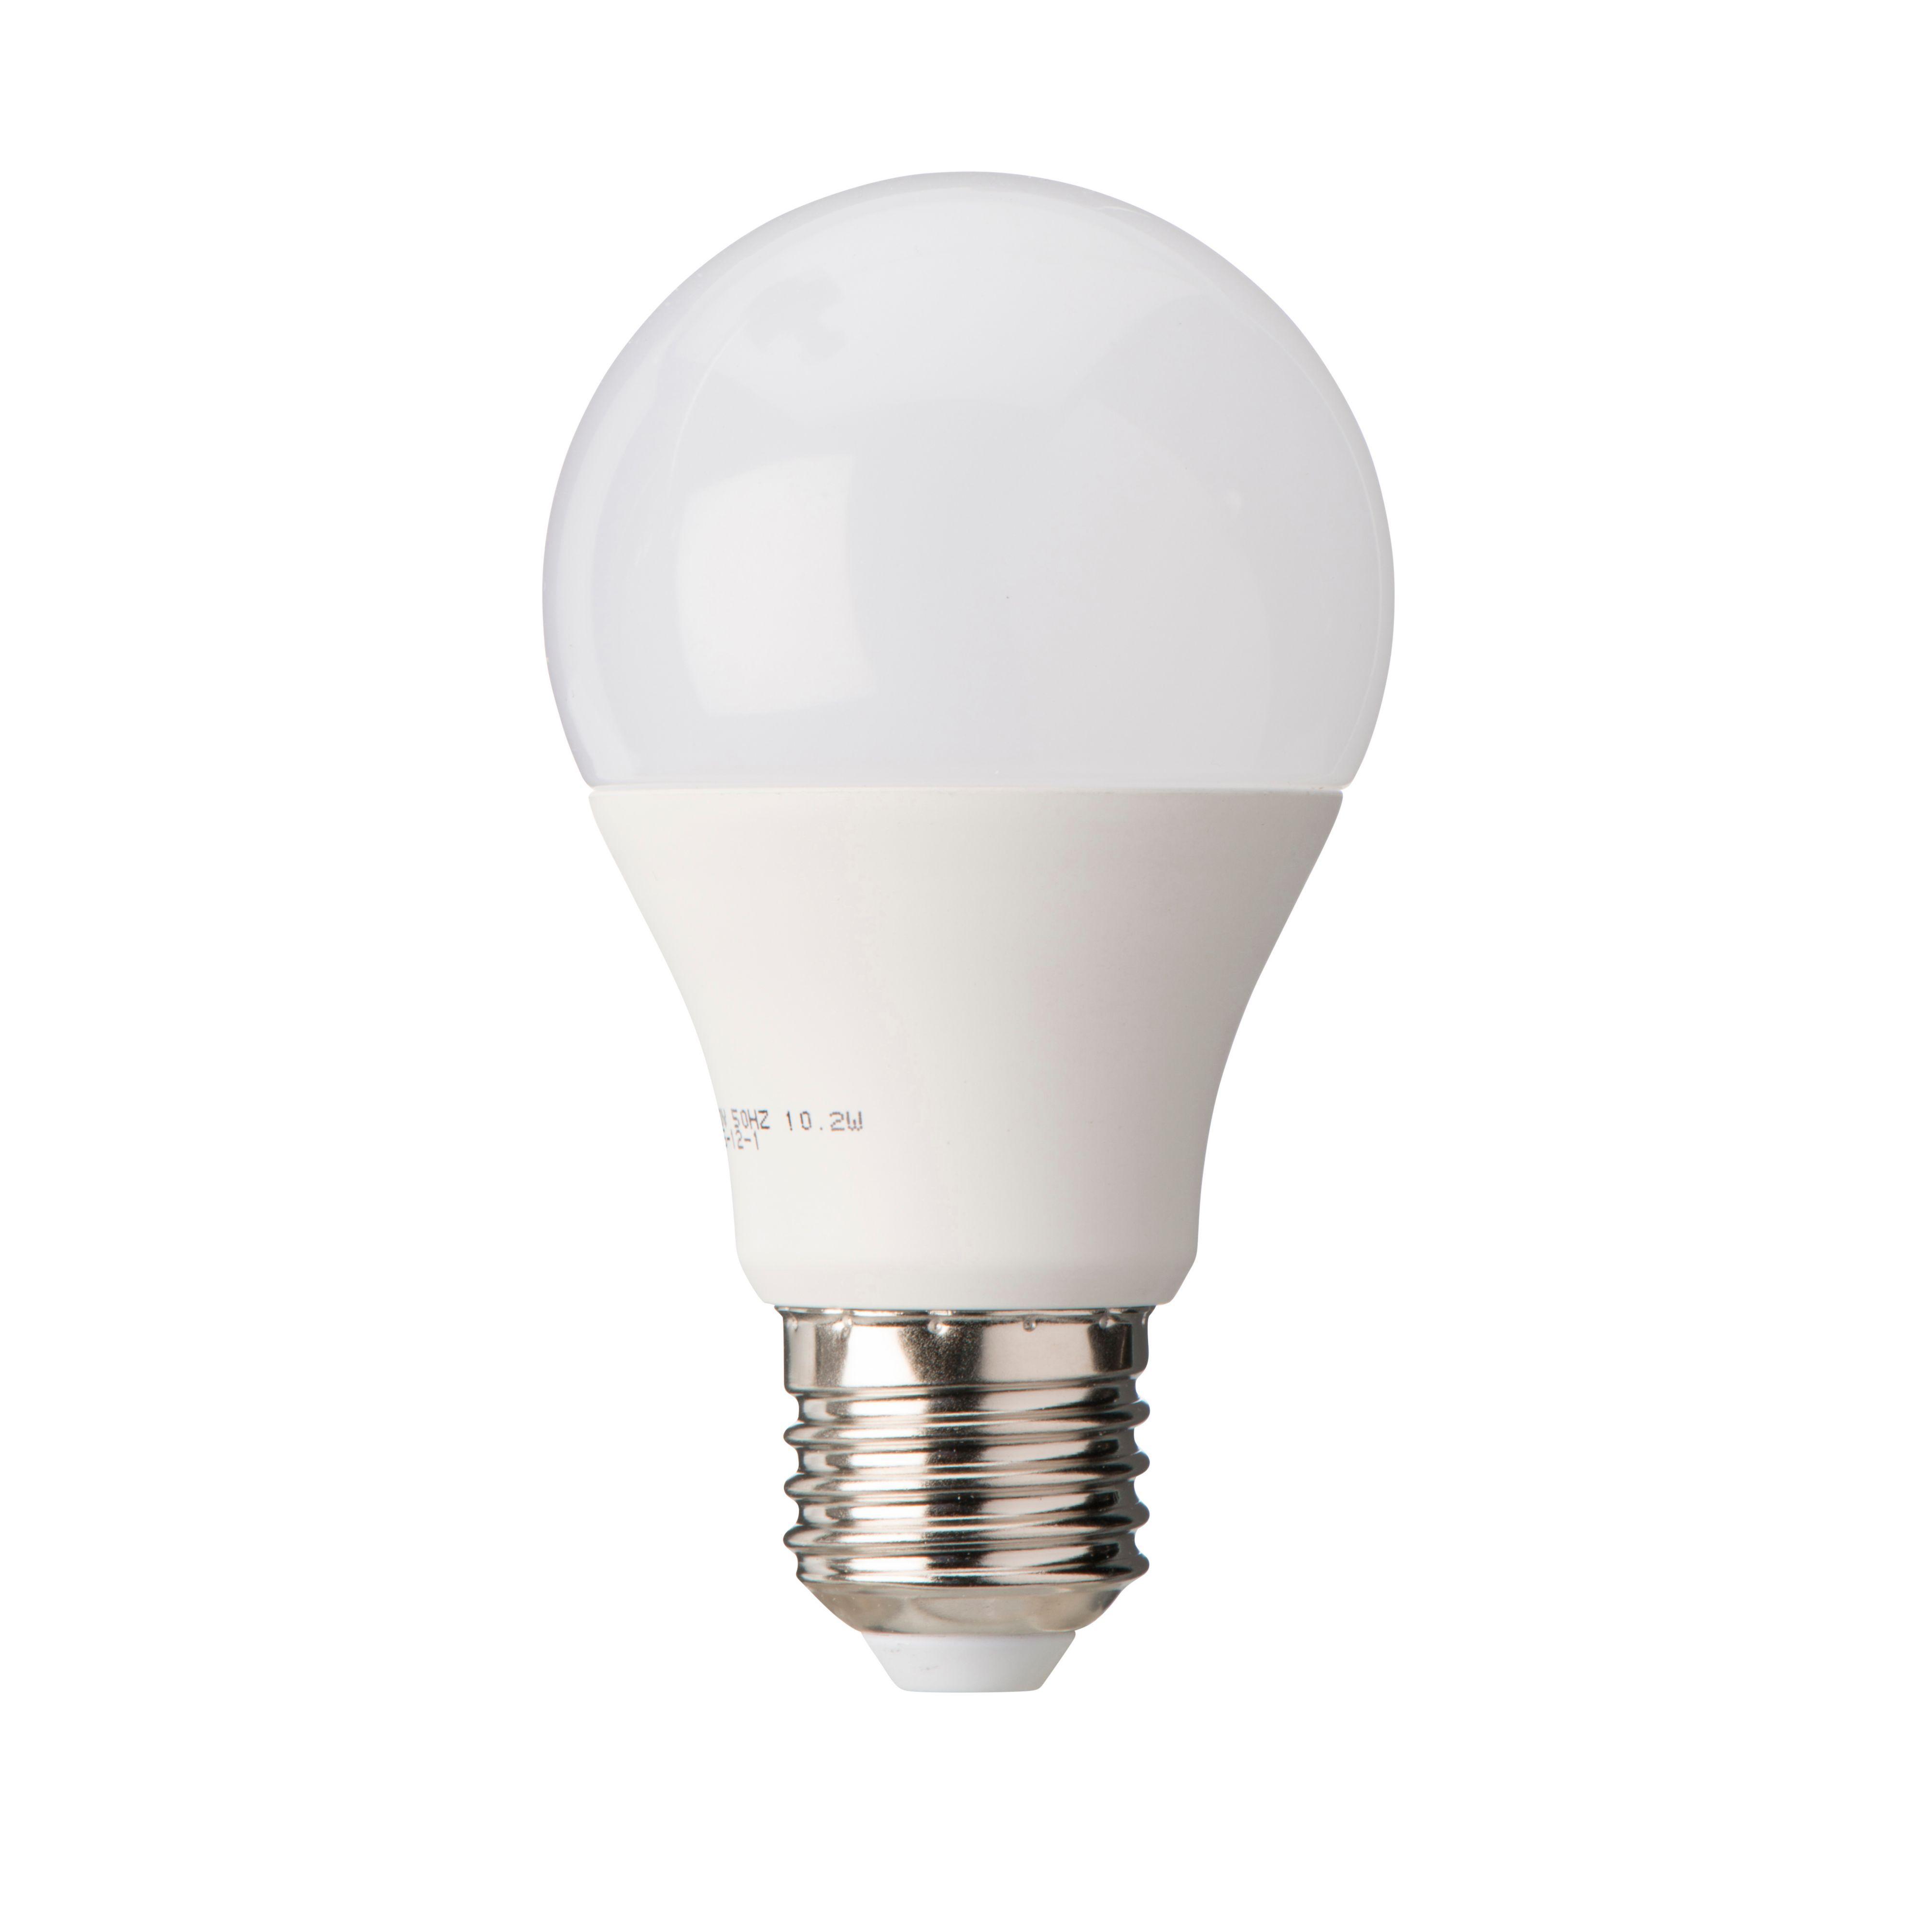 Philips Hue Led Smart Light Bulb Edison Screw Cap E27 Departments Diy At B Q